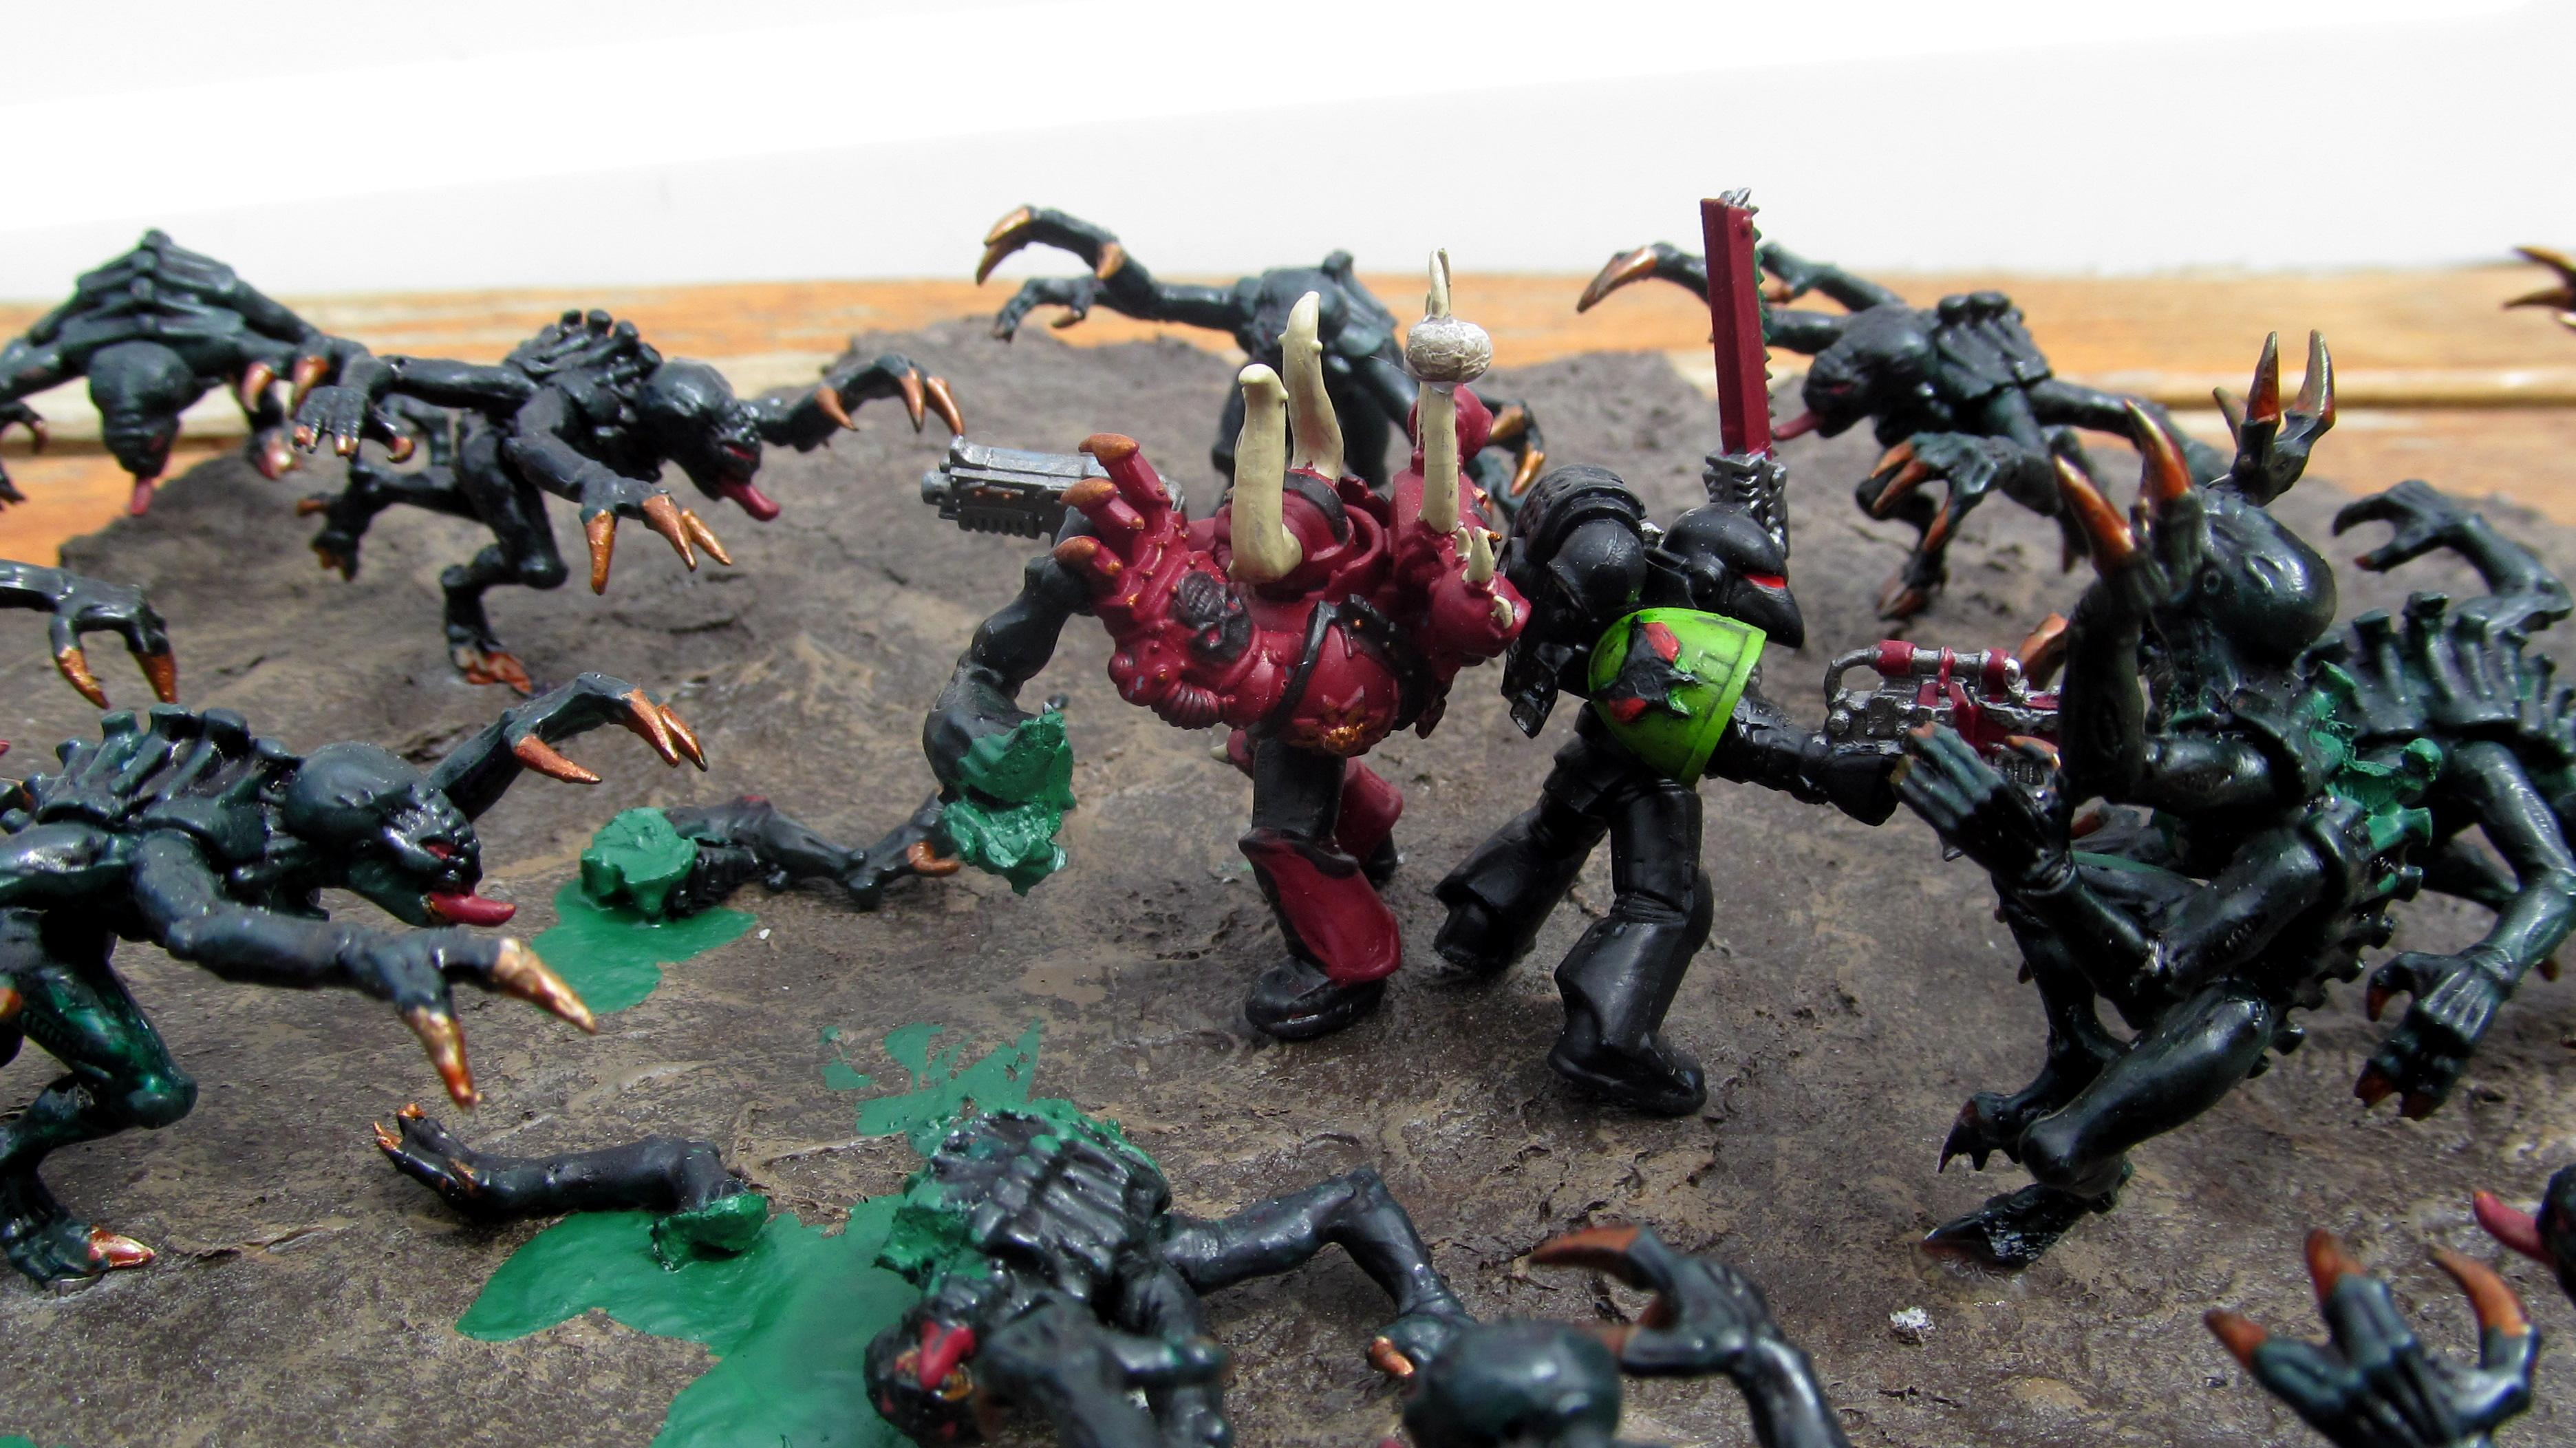 Diorama, Tyranids, Warhammer 40,000